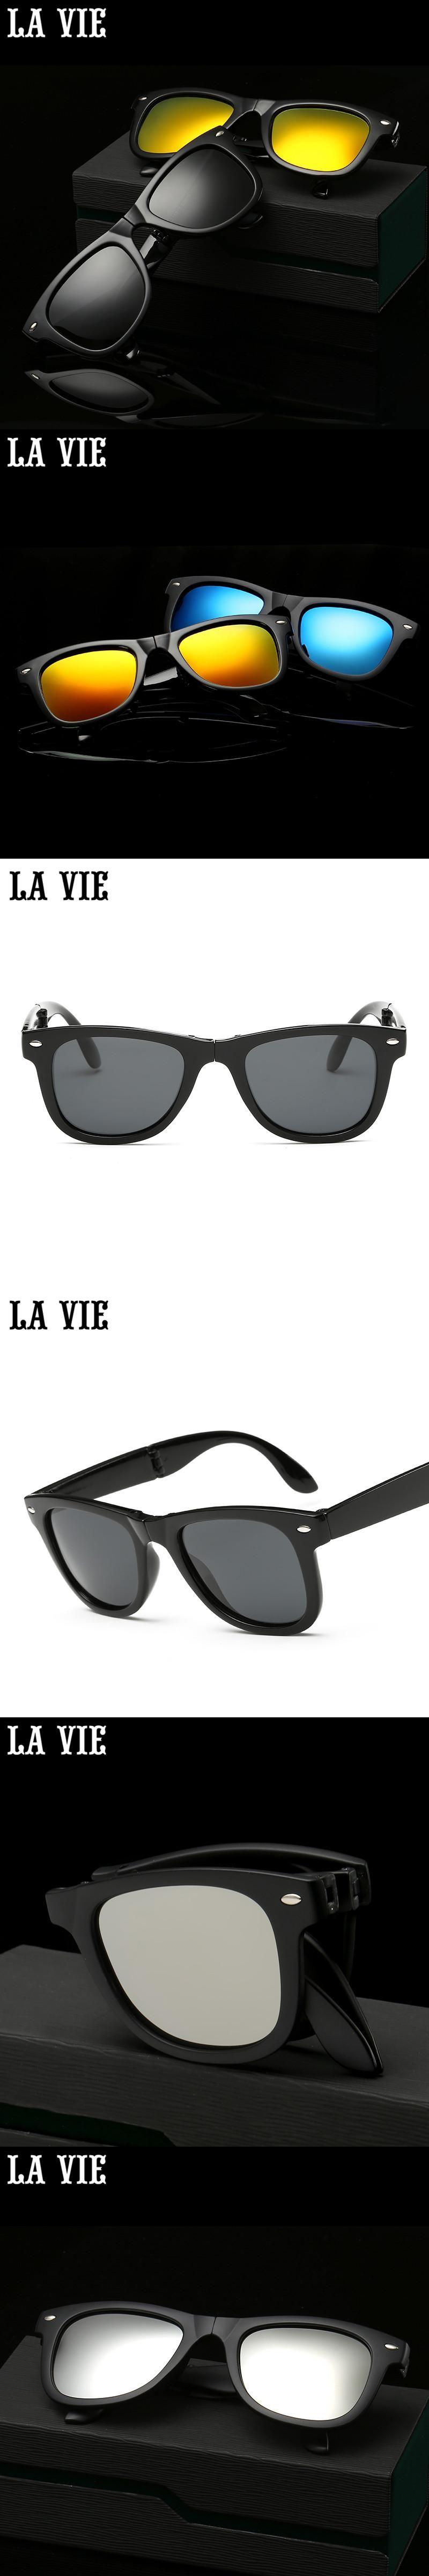 afa452c739 LA VIE Folding Polarized Sunglasses Mirror Coating Sunglasses Driving Sun  Glasses oculos de sol feminino LVF2140